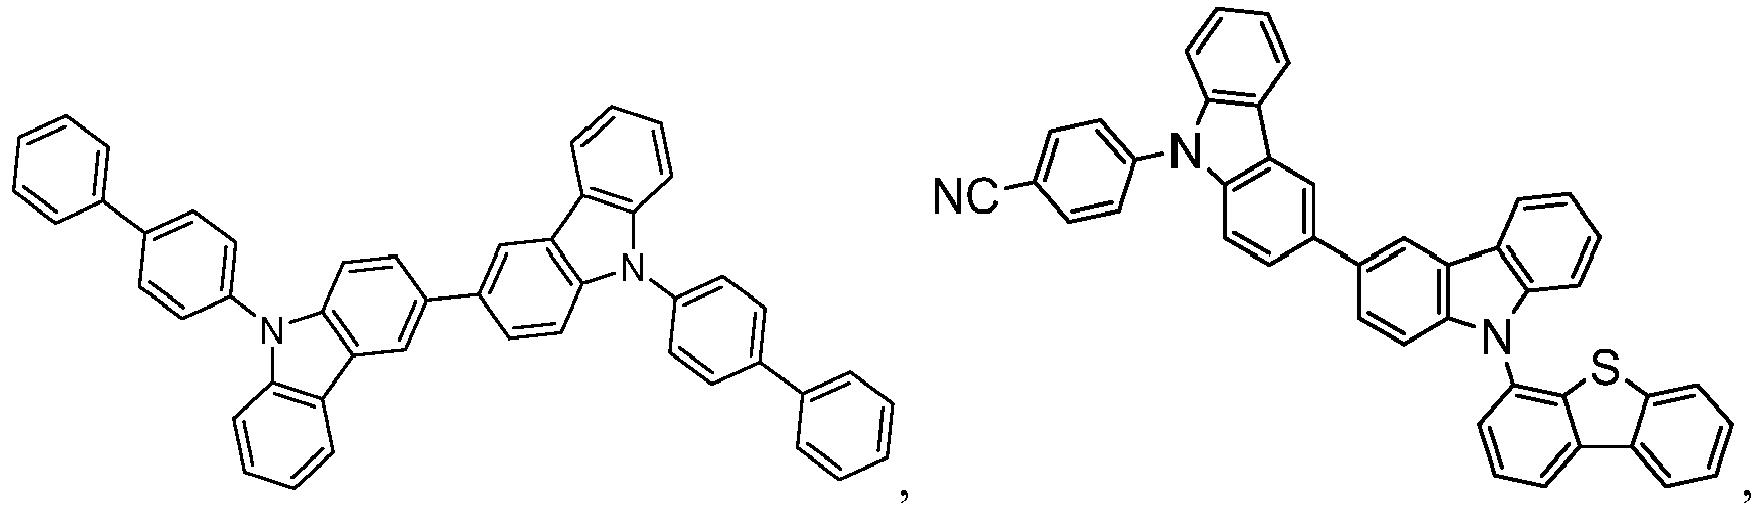 Figure imgb0985